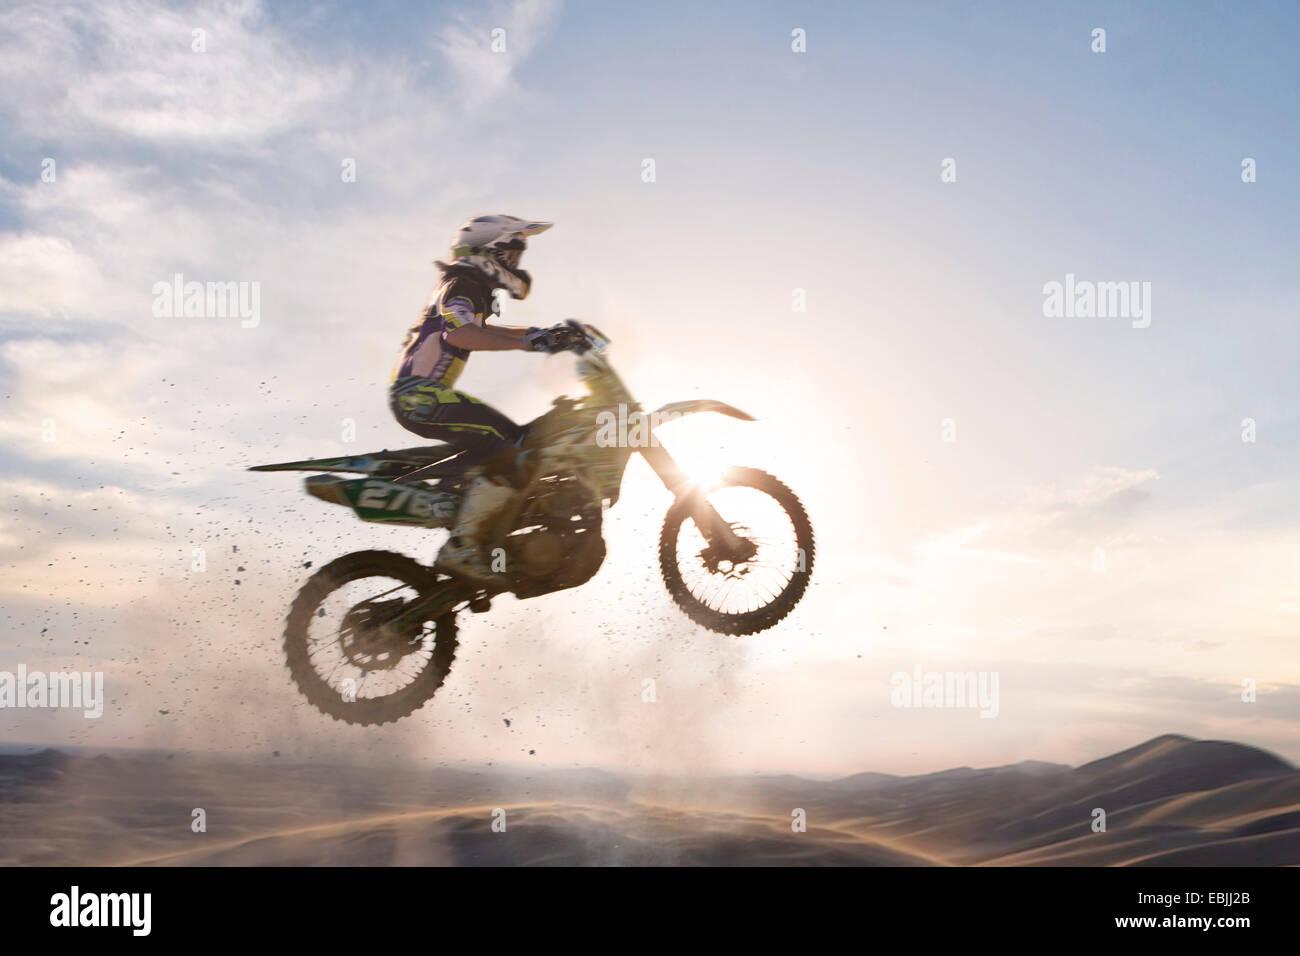 Silhouette, jungen männlichen Motocross Racer über Schlamm Track springen Stockbild